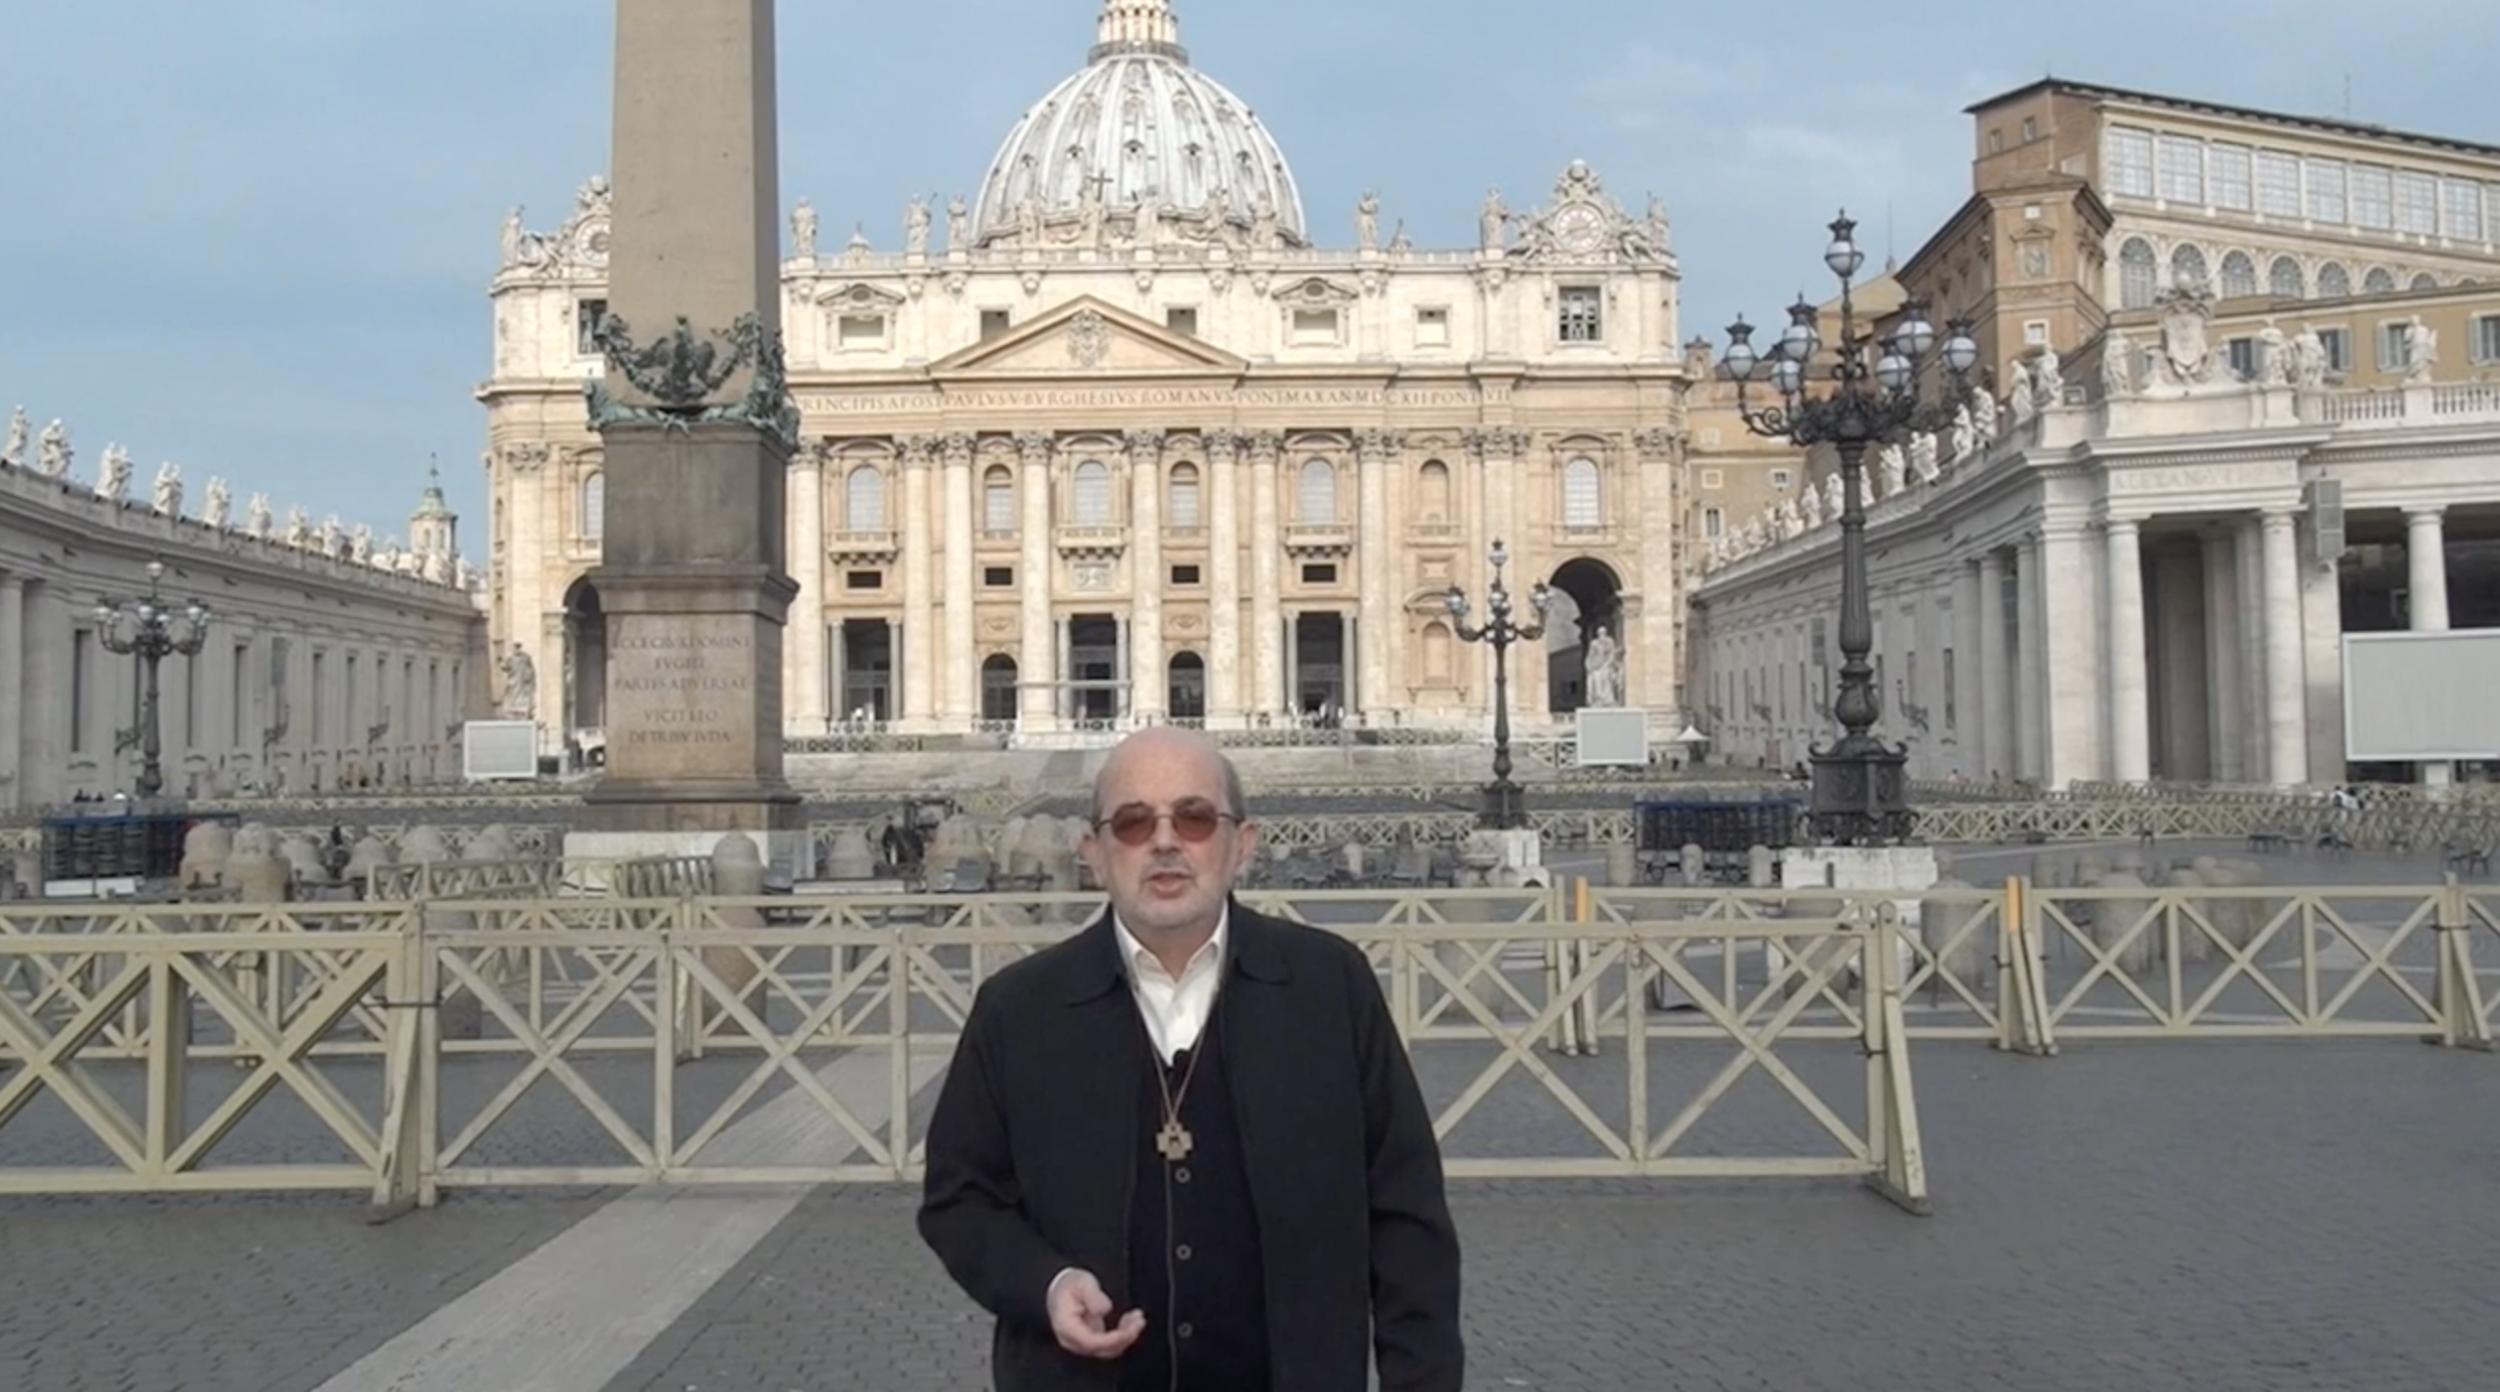 Marist Superior General, Br Emili Turú introducing his Champagnat Day video